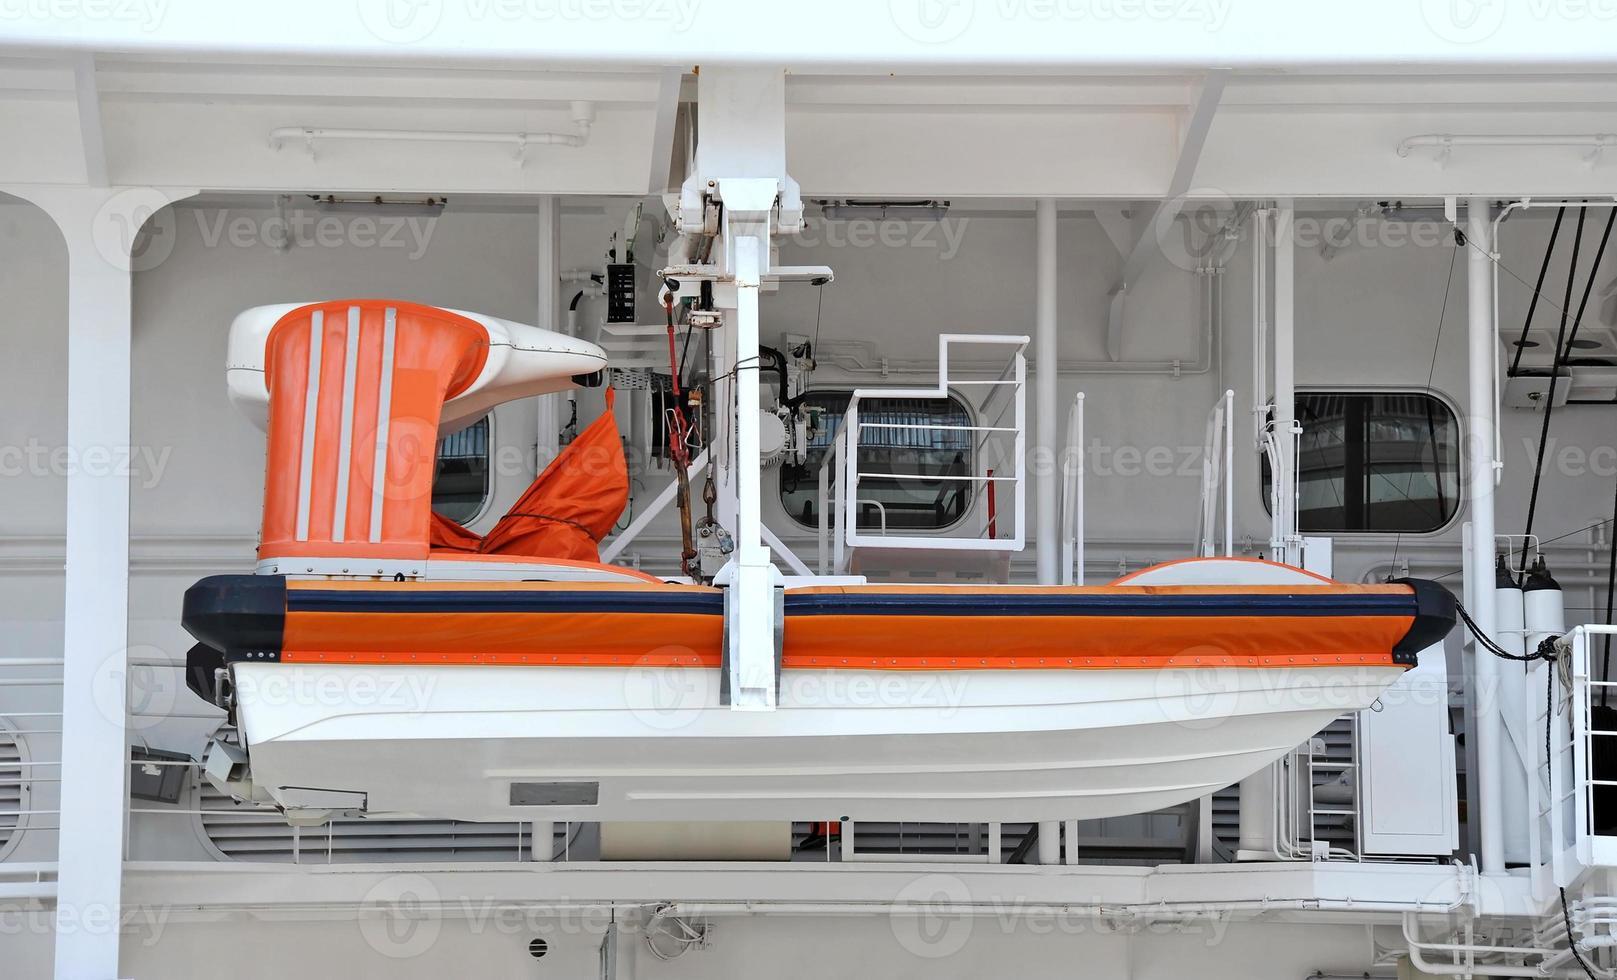 barco salva-vidas de segurança foto